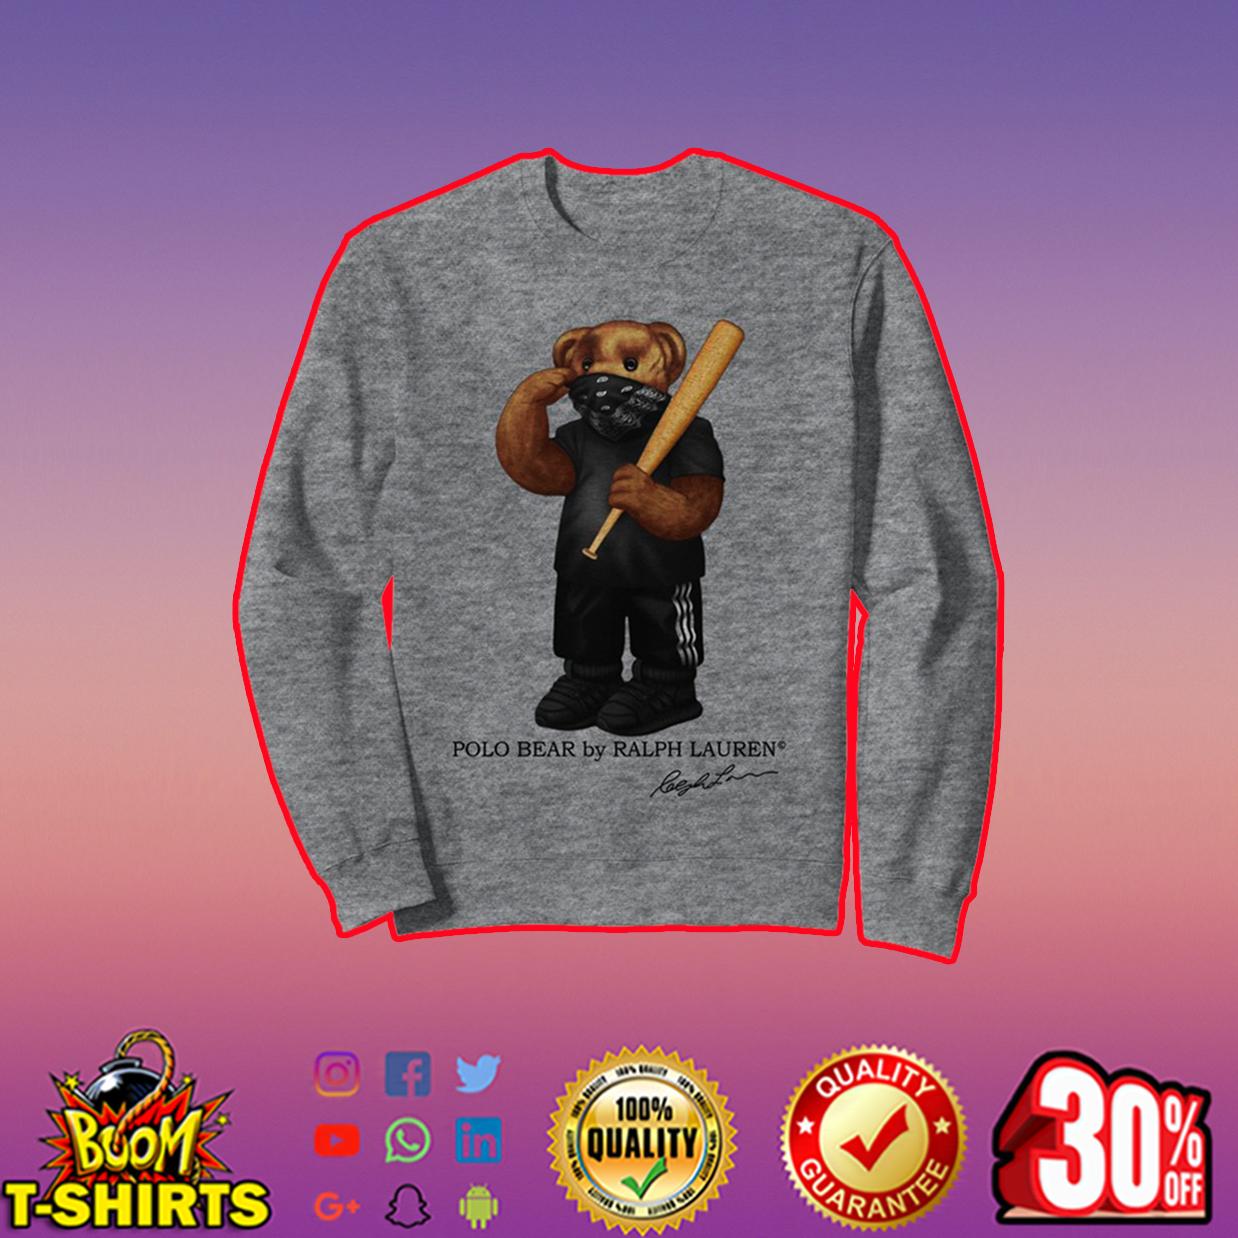 Polo Bear by Ralph Lauren Signature sweatshirt